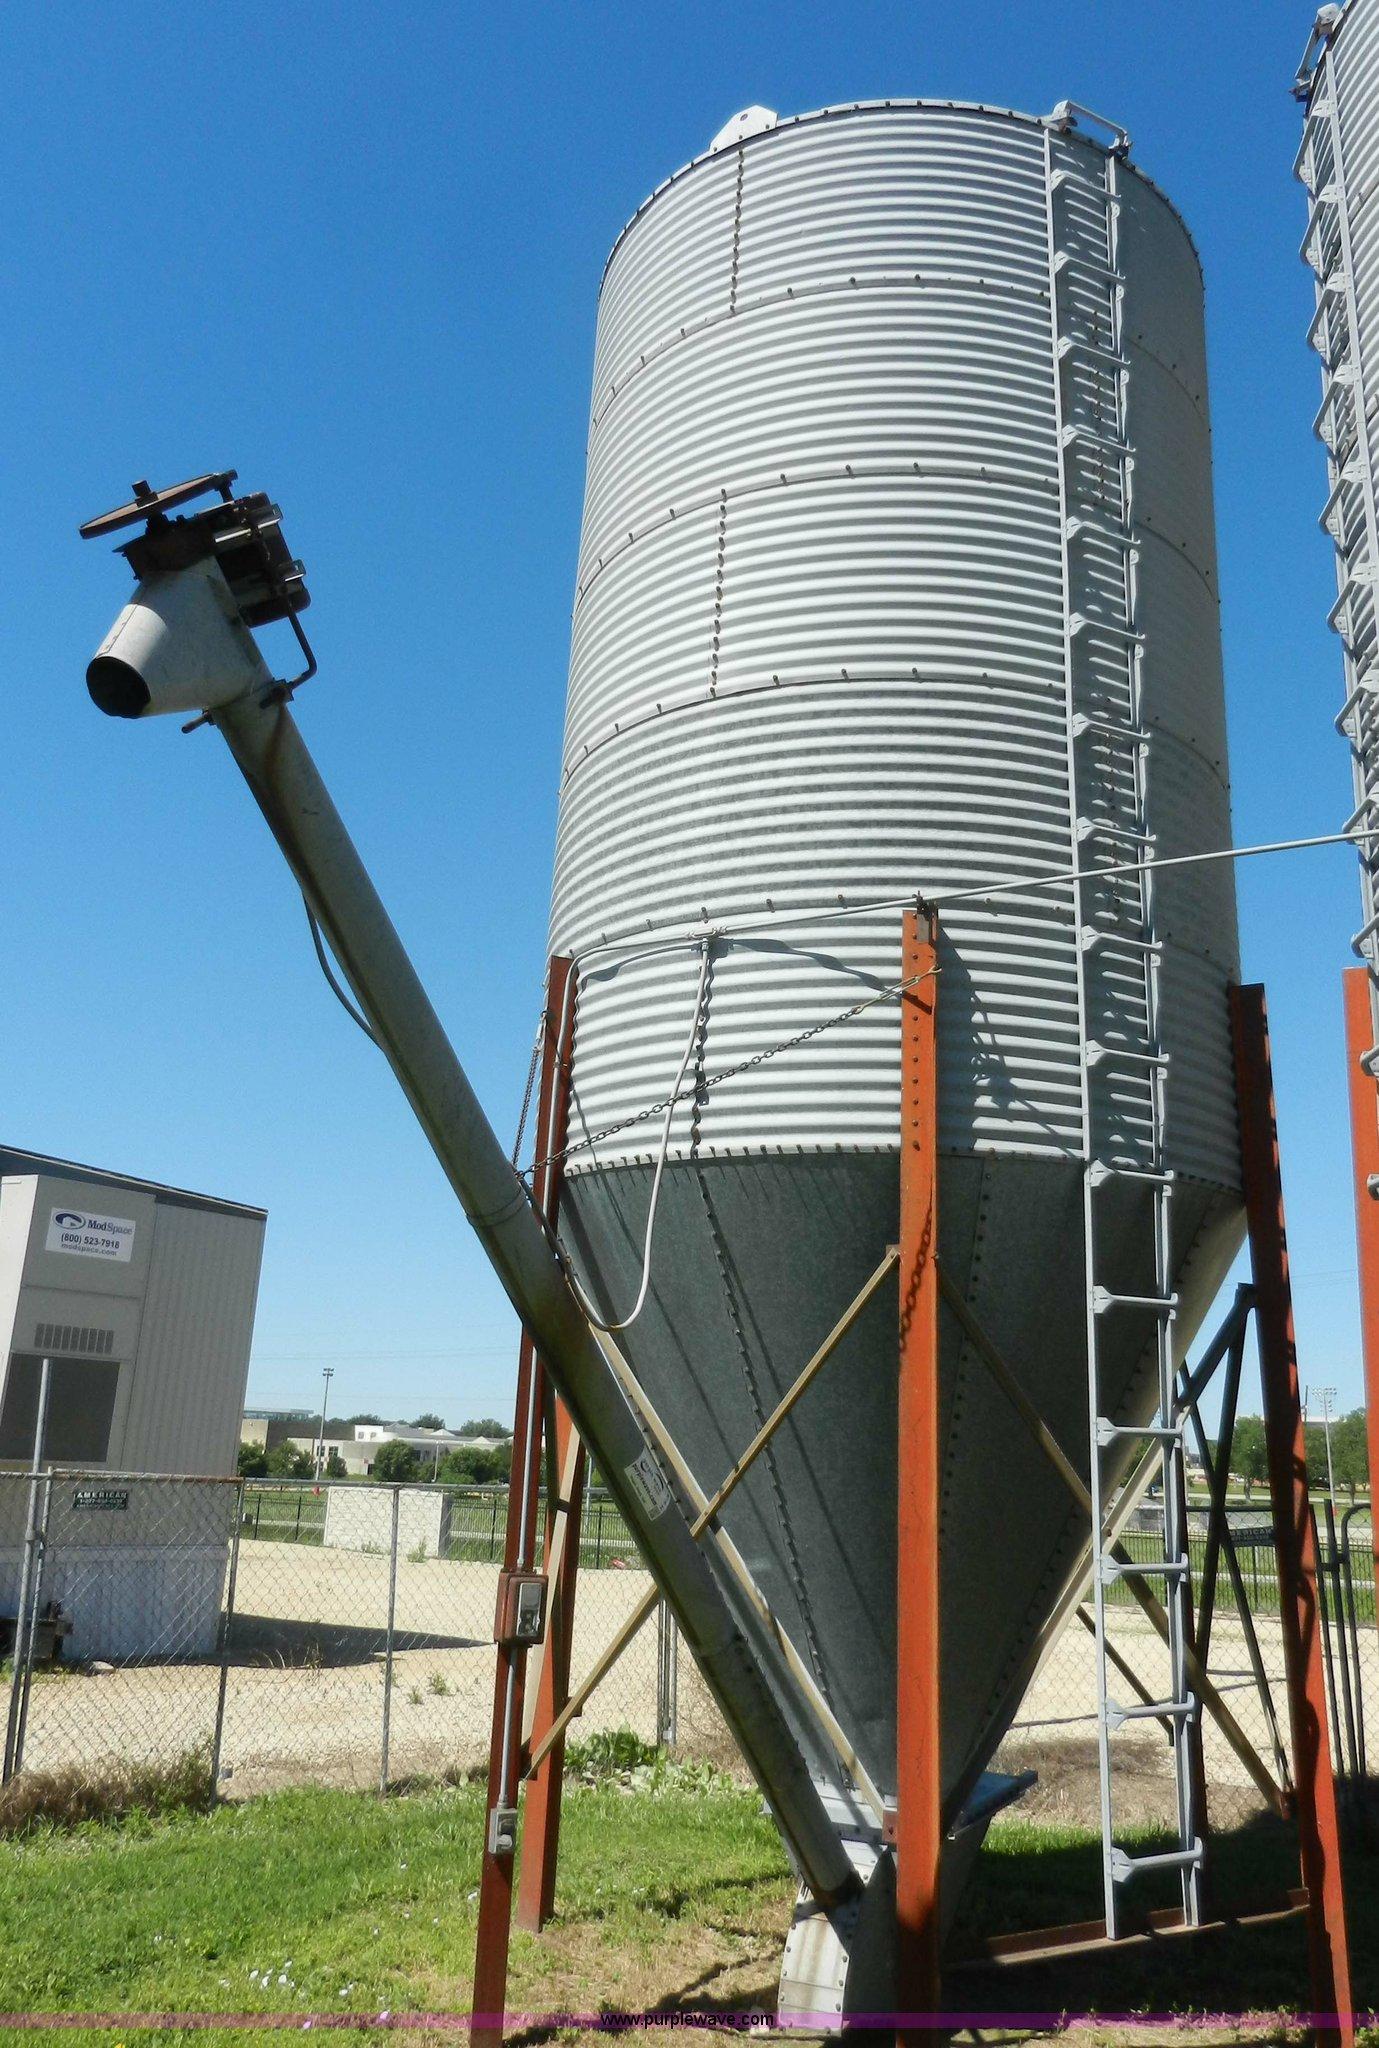 Bulk grain bin with auger | Item H3078 | SOLD! June 26 Ag Eq